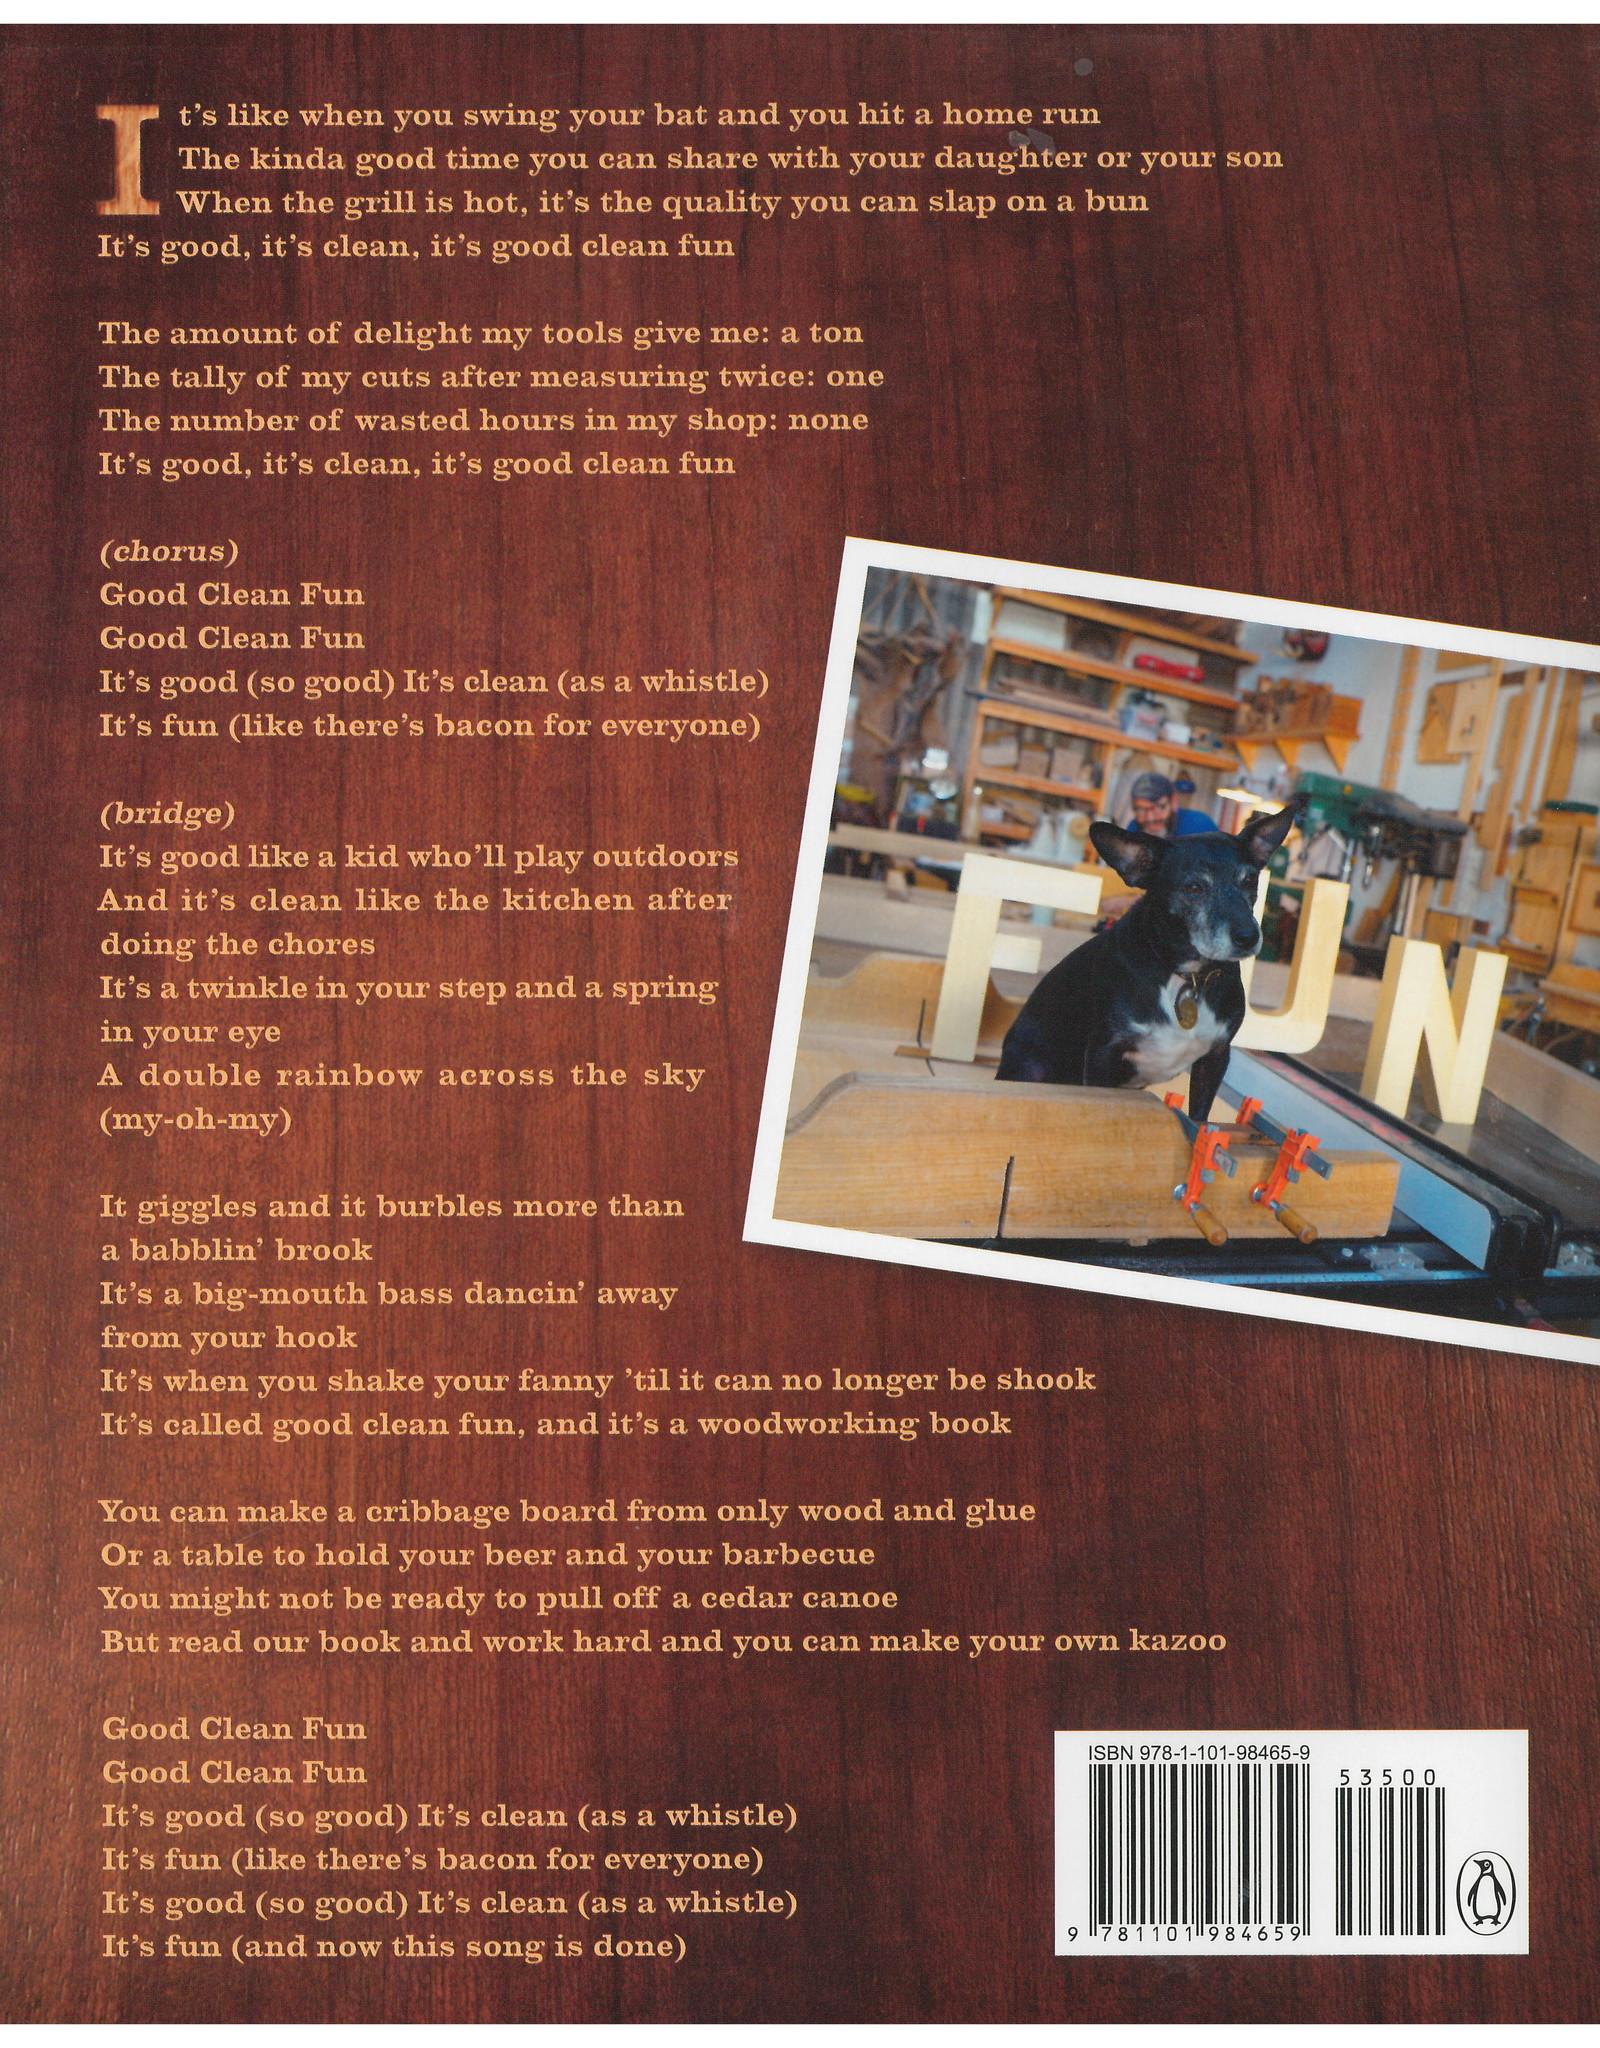 Good Clean Fun: Misadventures in Sawdust at Offerman Woodshop Offerman, Nick